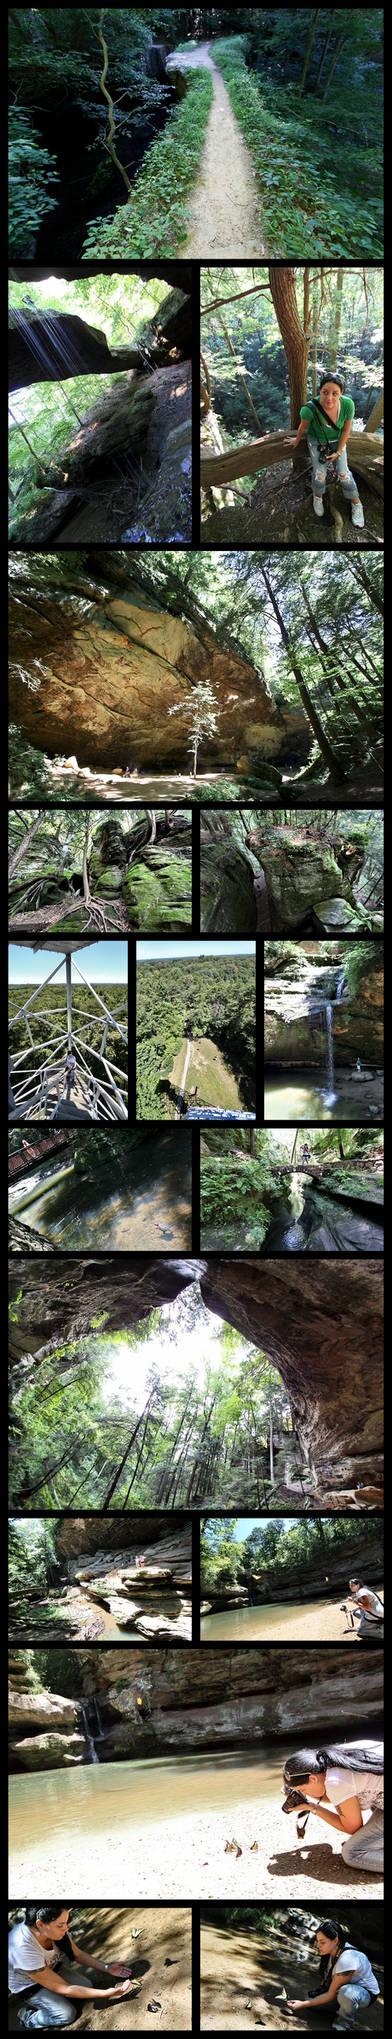 Butterflies and Waterfalls